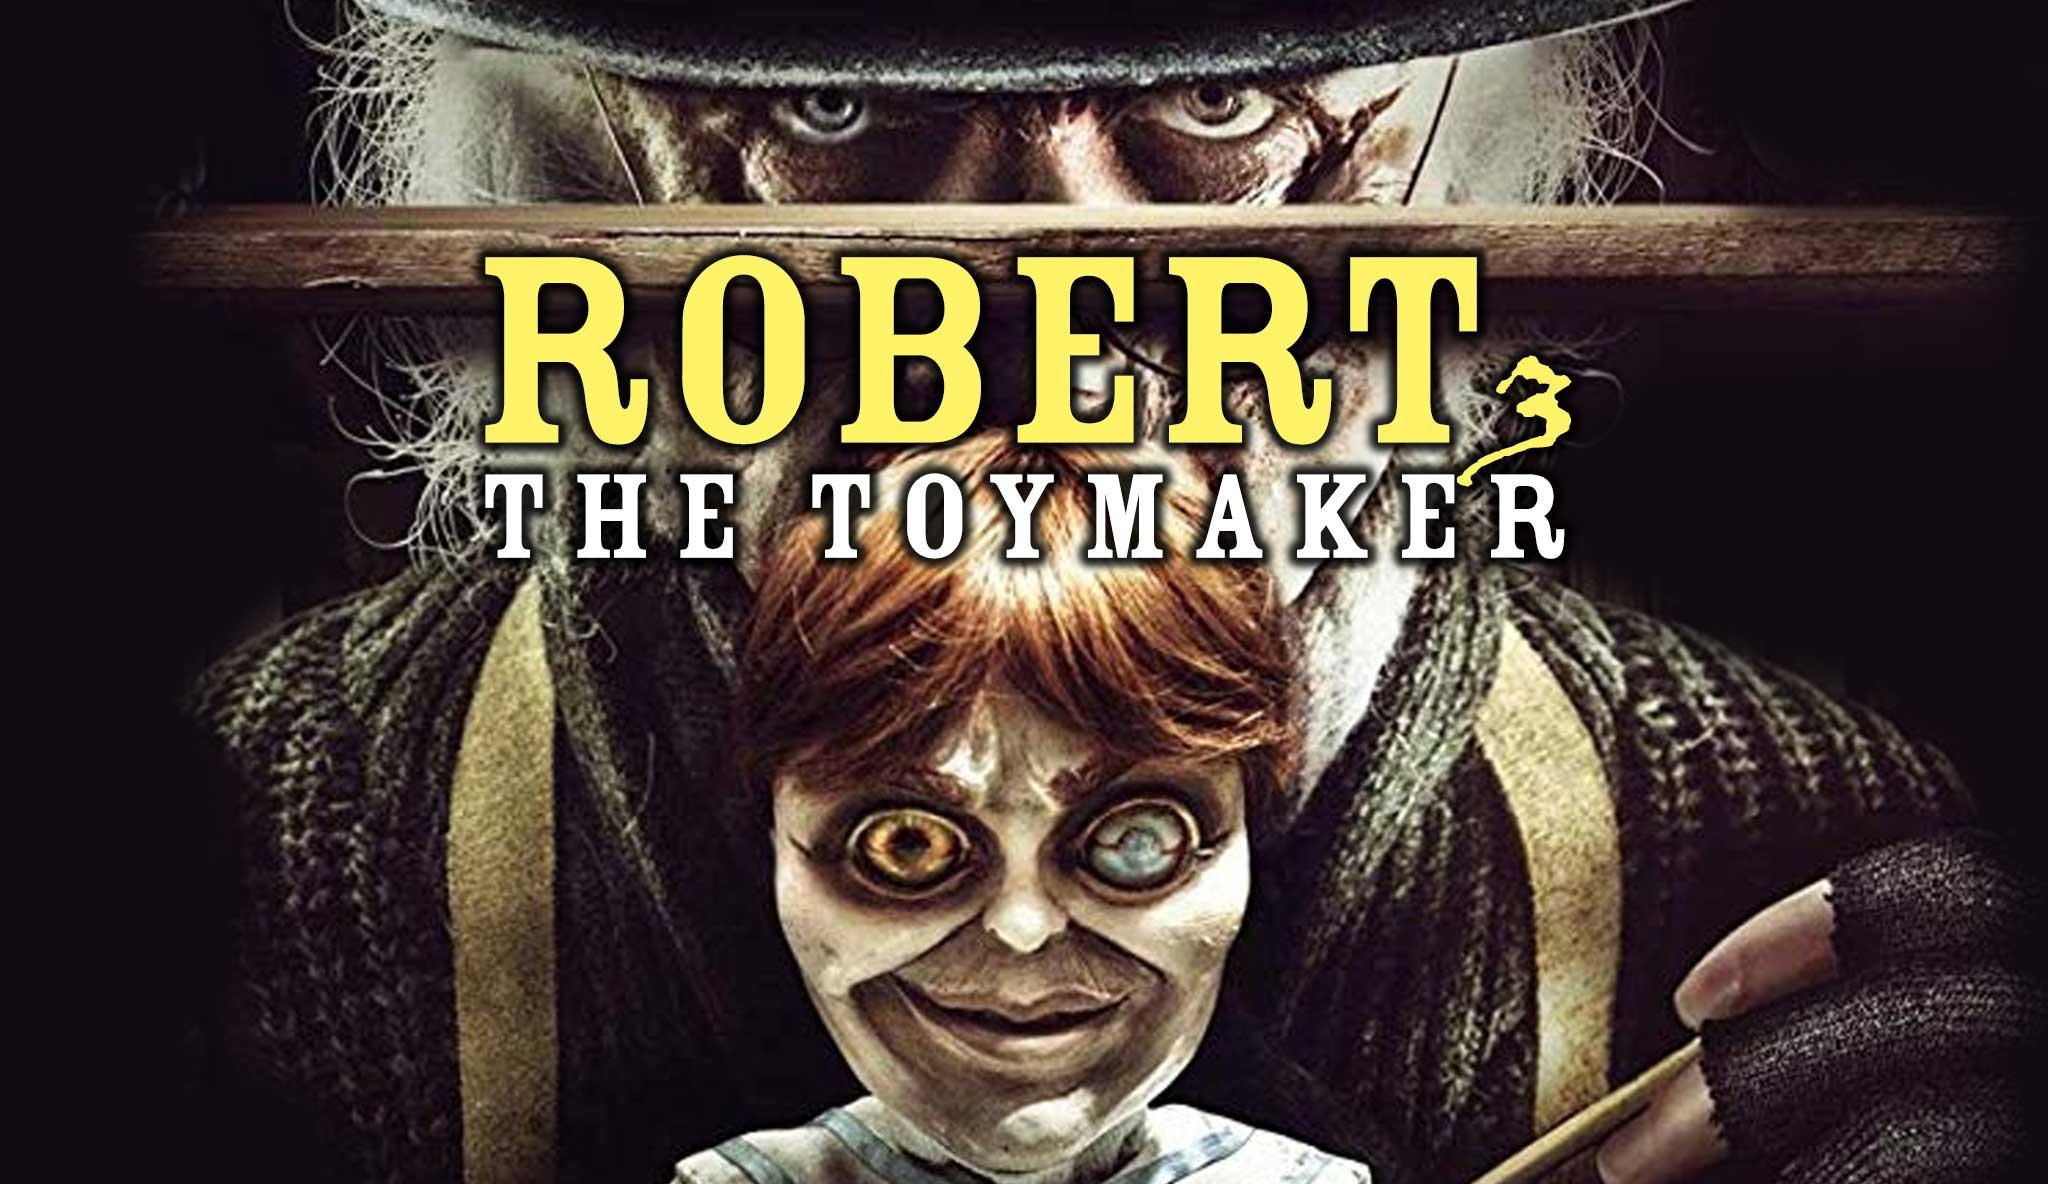 robert-3-the-toymaker\header.jpg